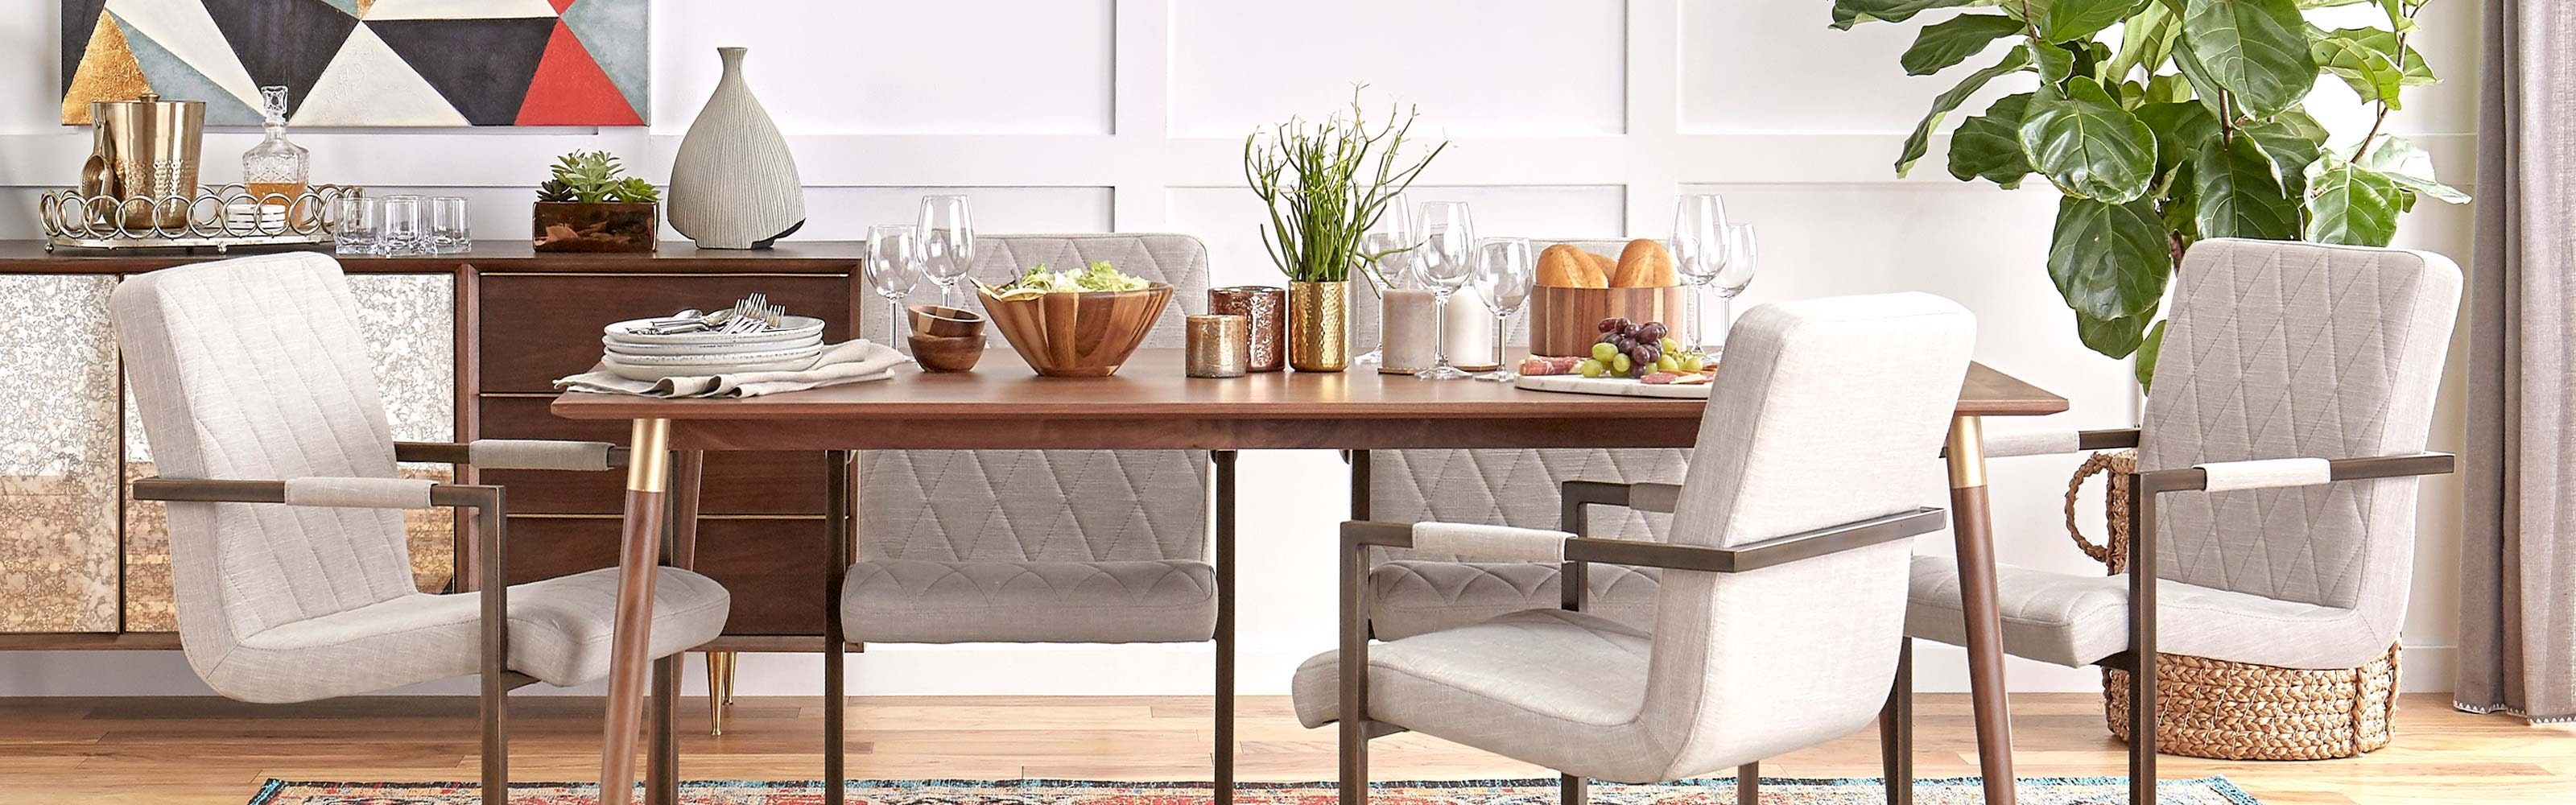 Mid Century Modern Dining Room Tables & Sets